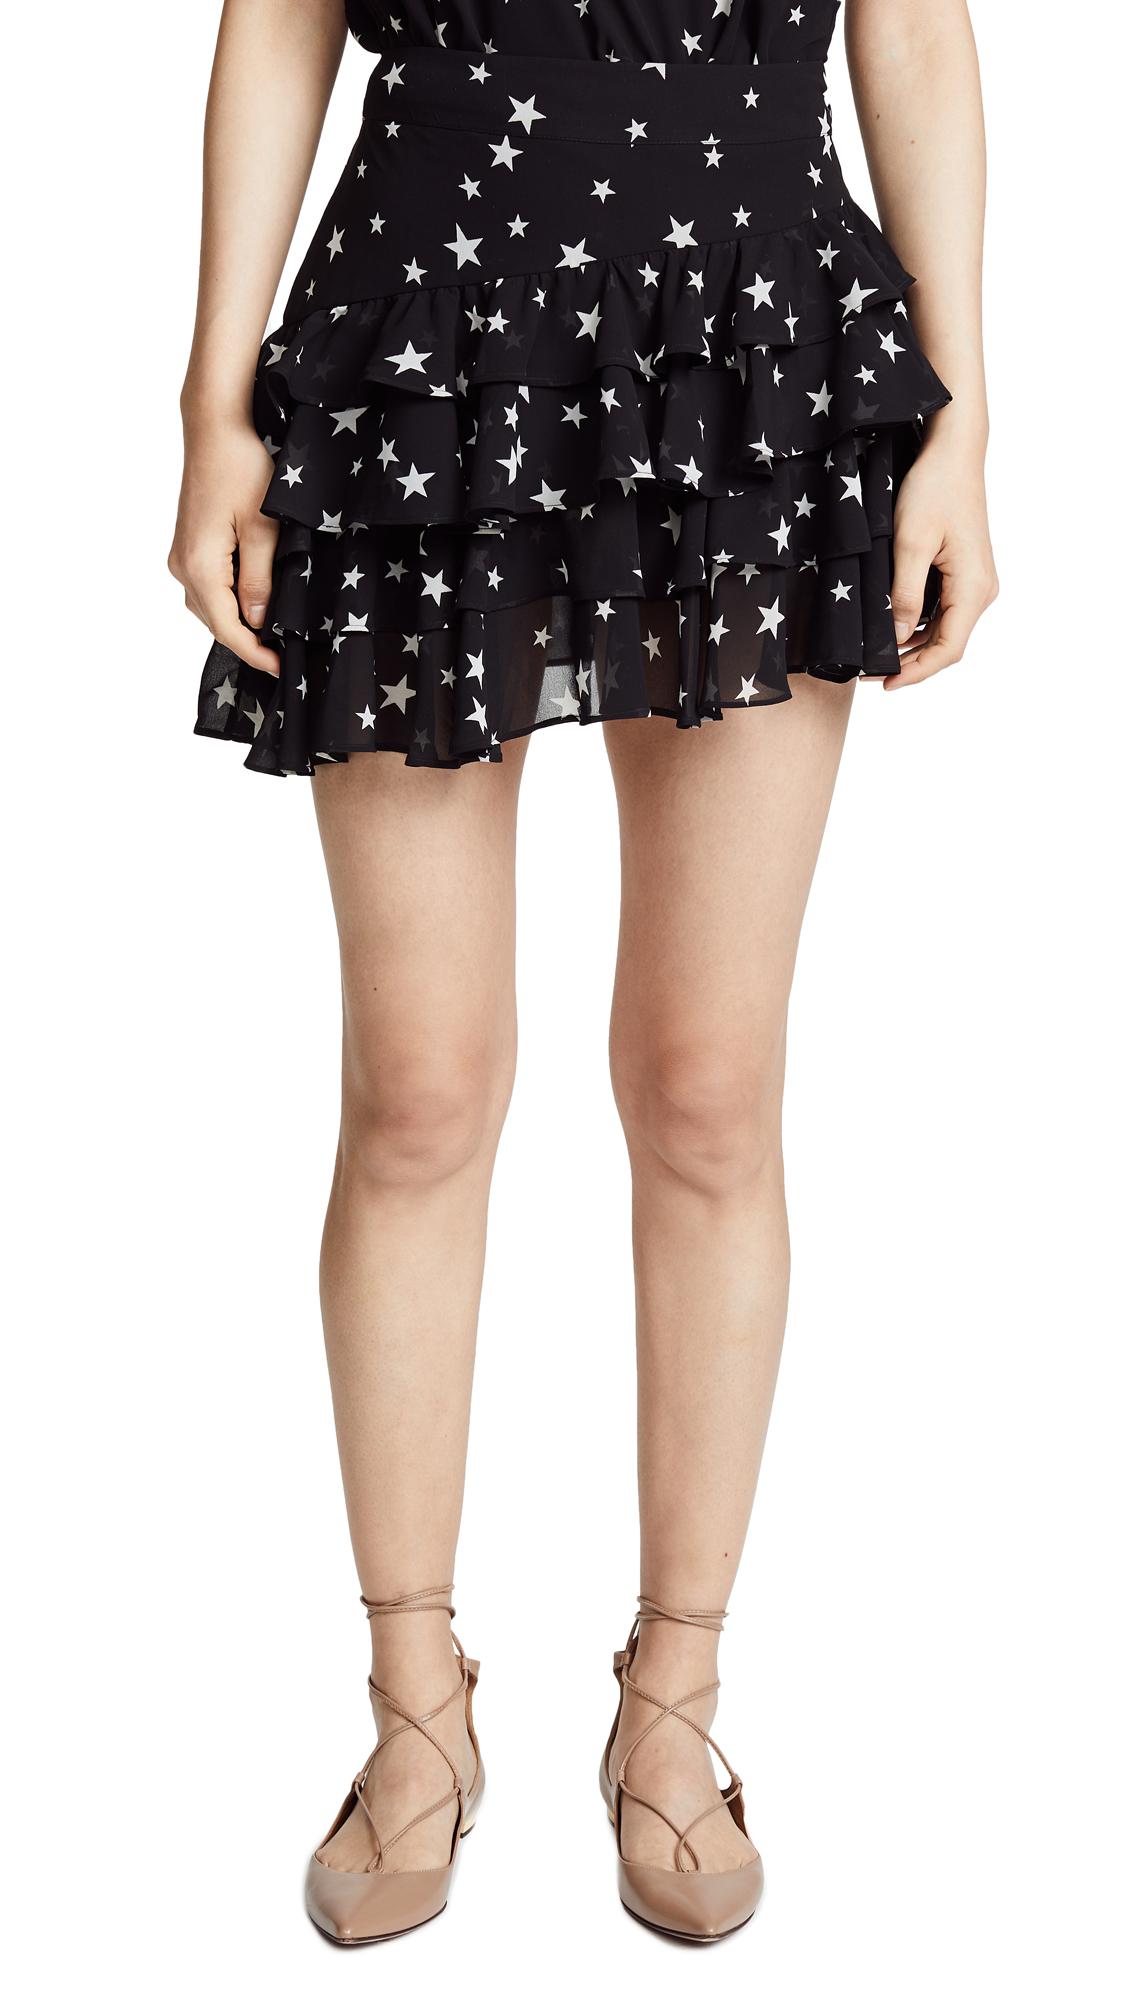 Valencia & Vine Jenny Miniskirt - Star Print